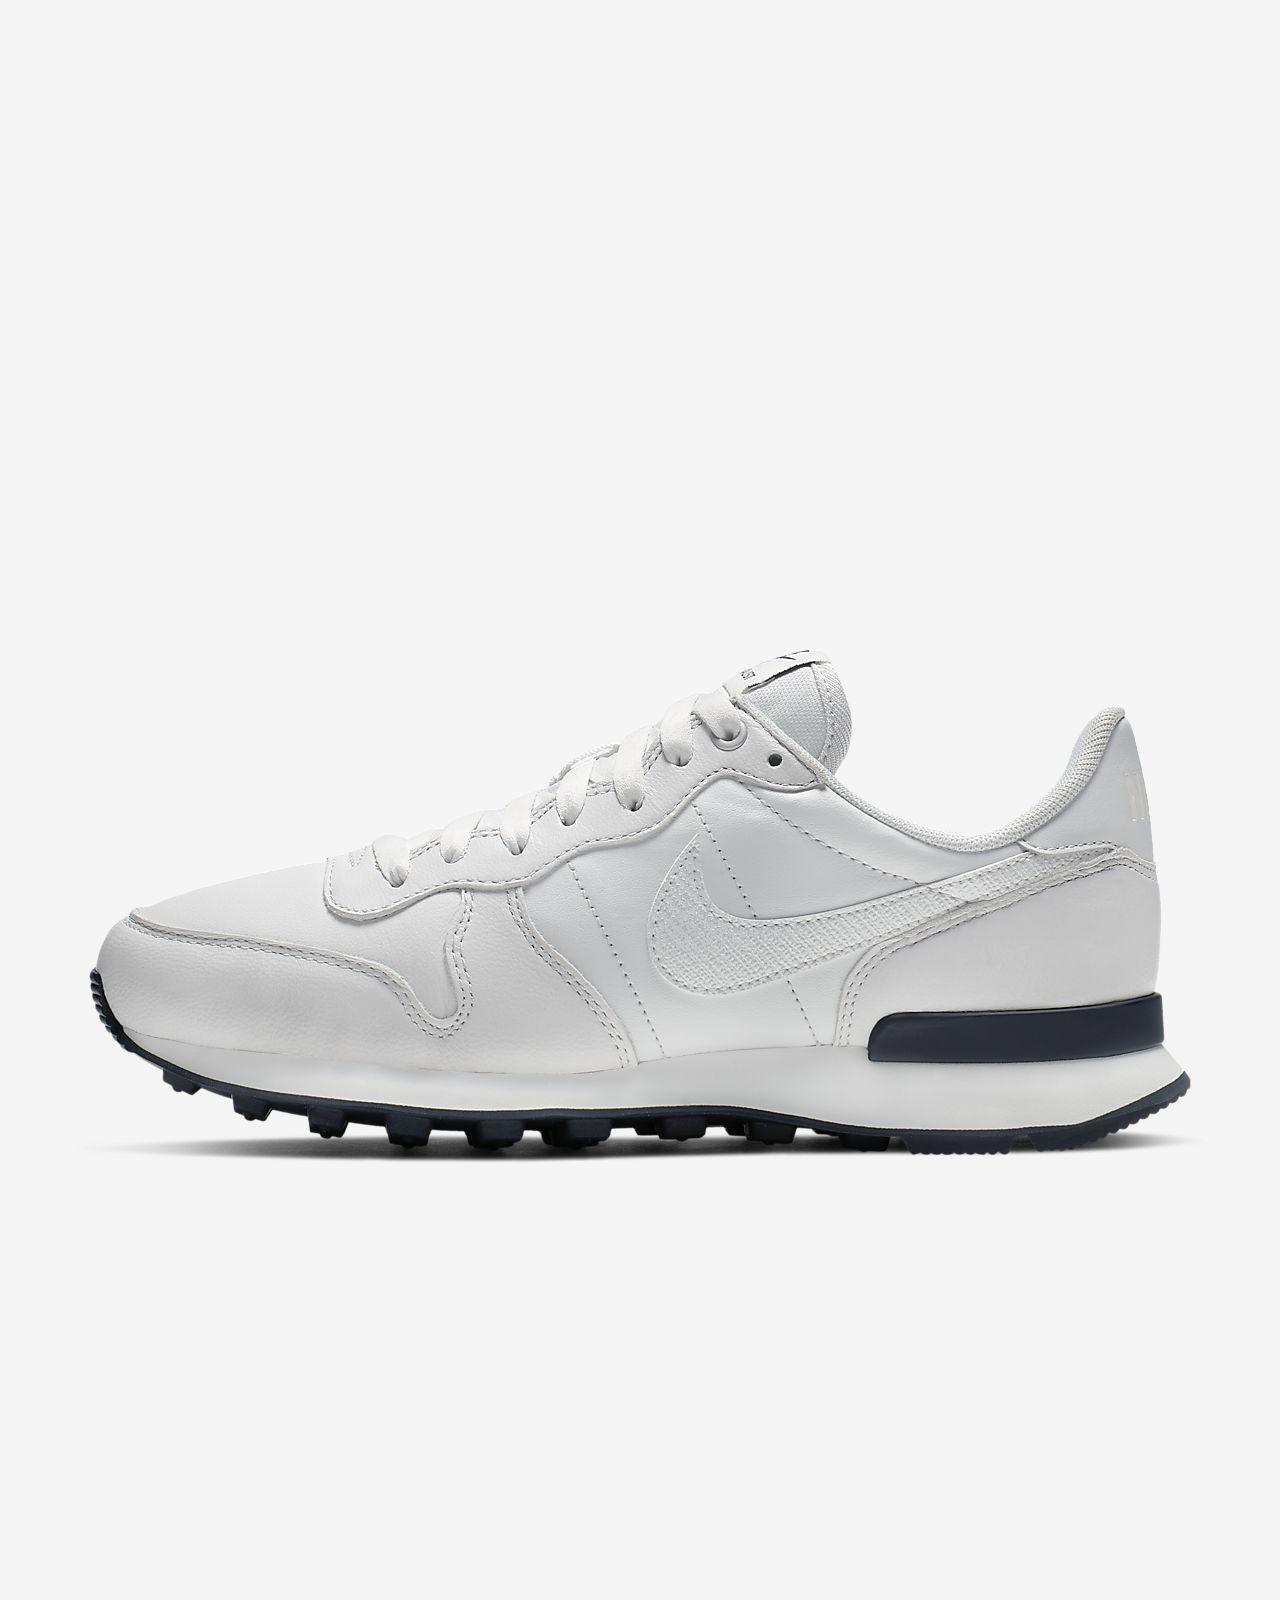 best sneakers e03c1 3ab64 Low Resolution Nike Internationalist Premium Women s Shoe Nike  Internationalist Premium Women s Shoe